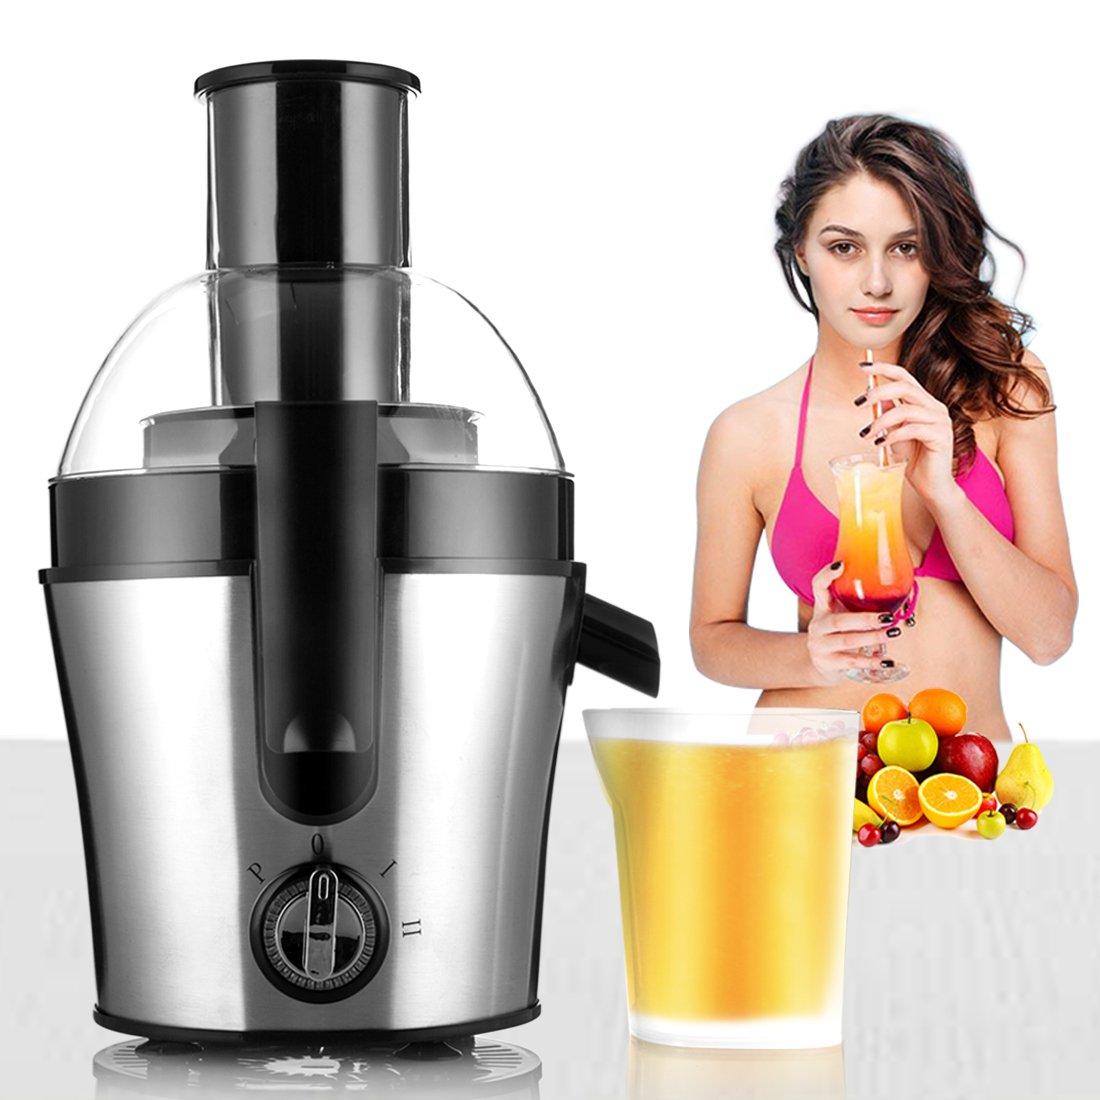 Juice Maker, Professional Orange Juice Maker Fresh Cool Centrifugal Juice Extractor